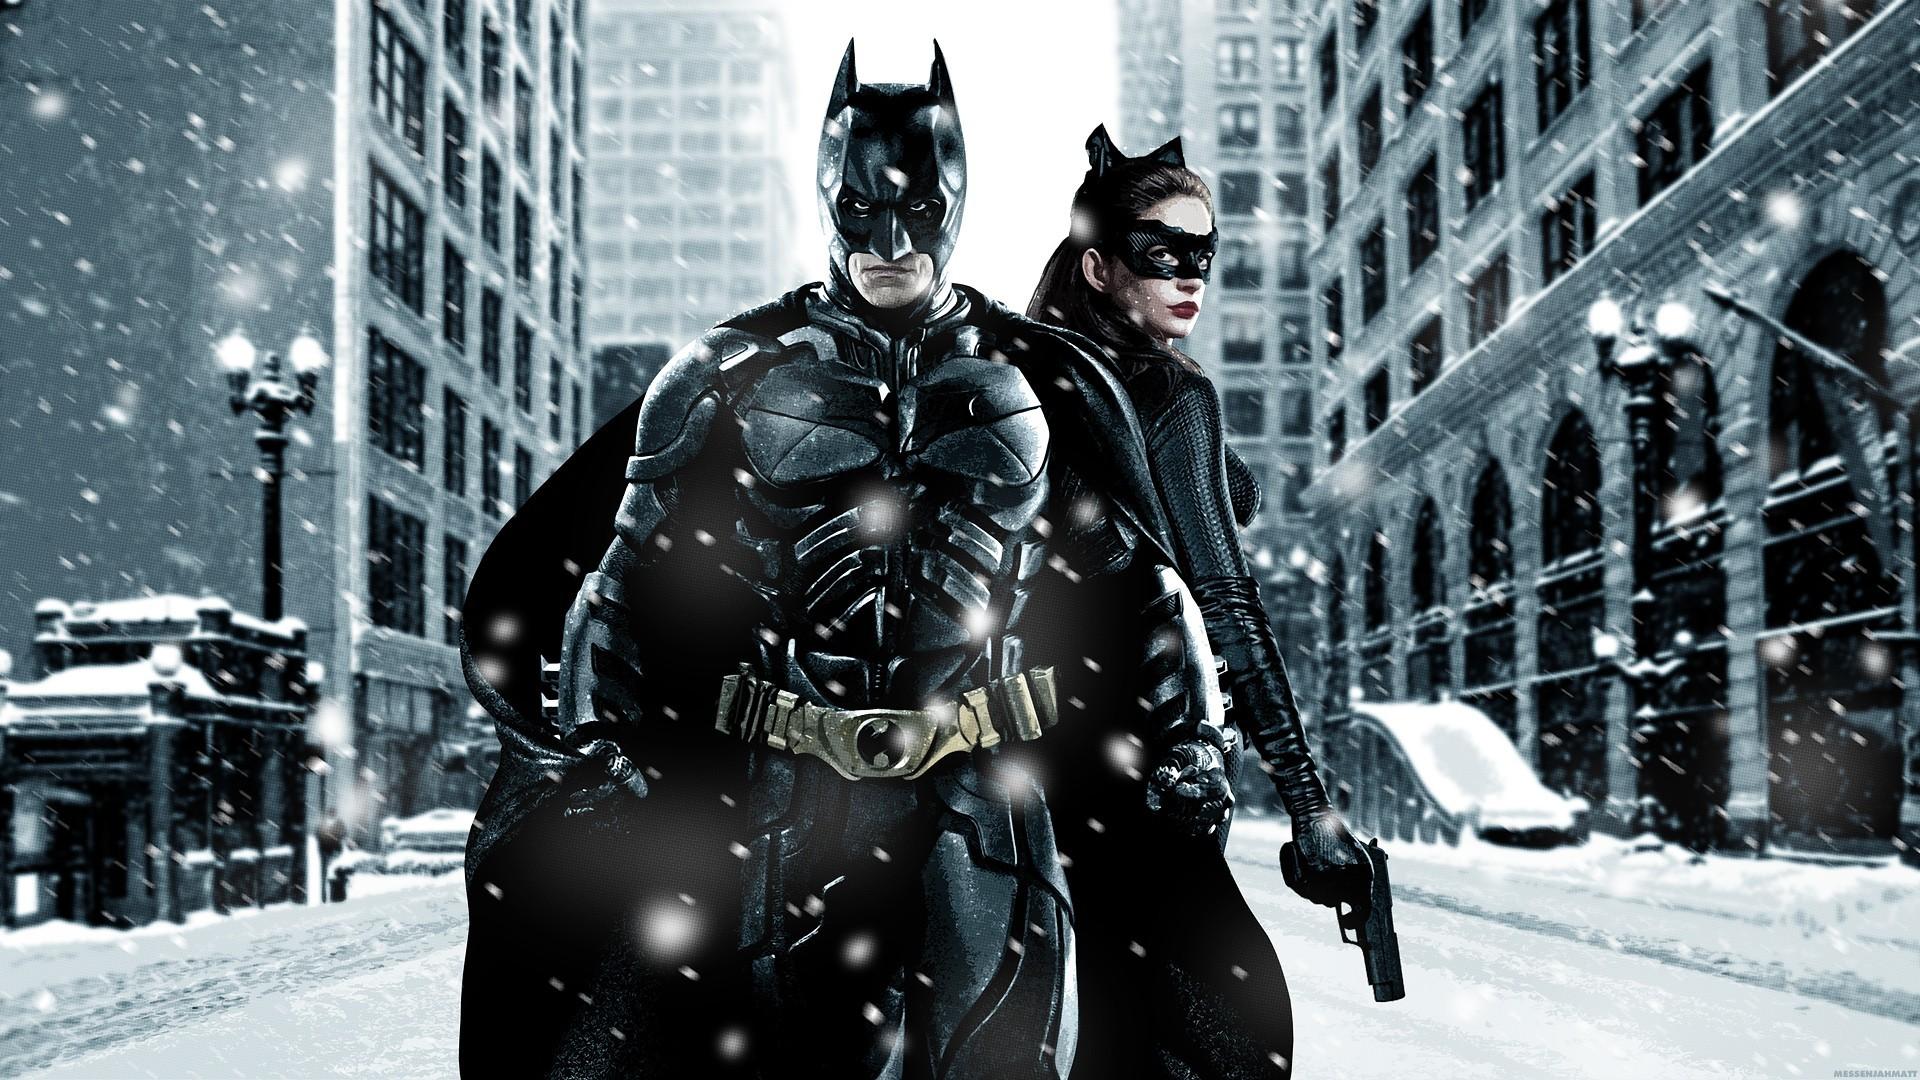 Batman and Catwoman HD Wallpaper